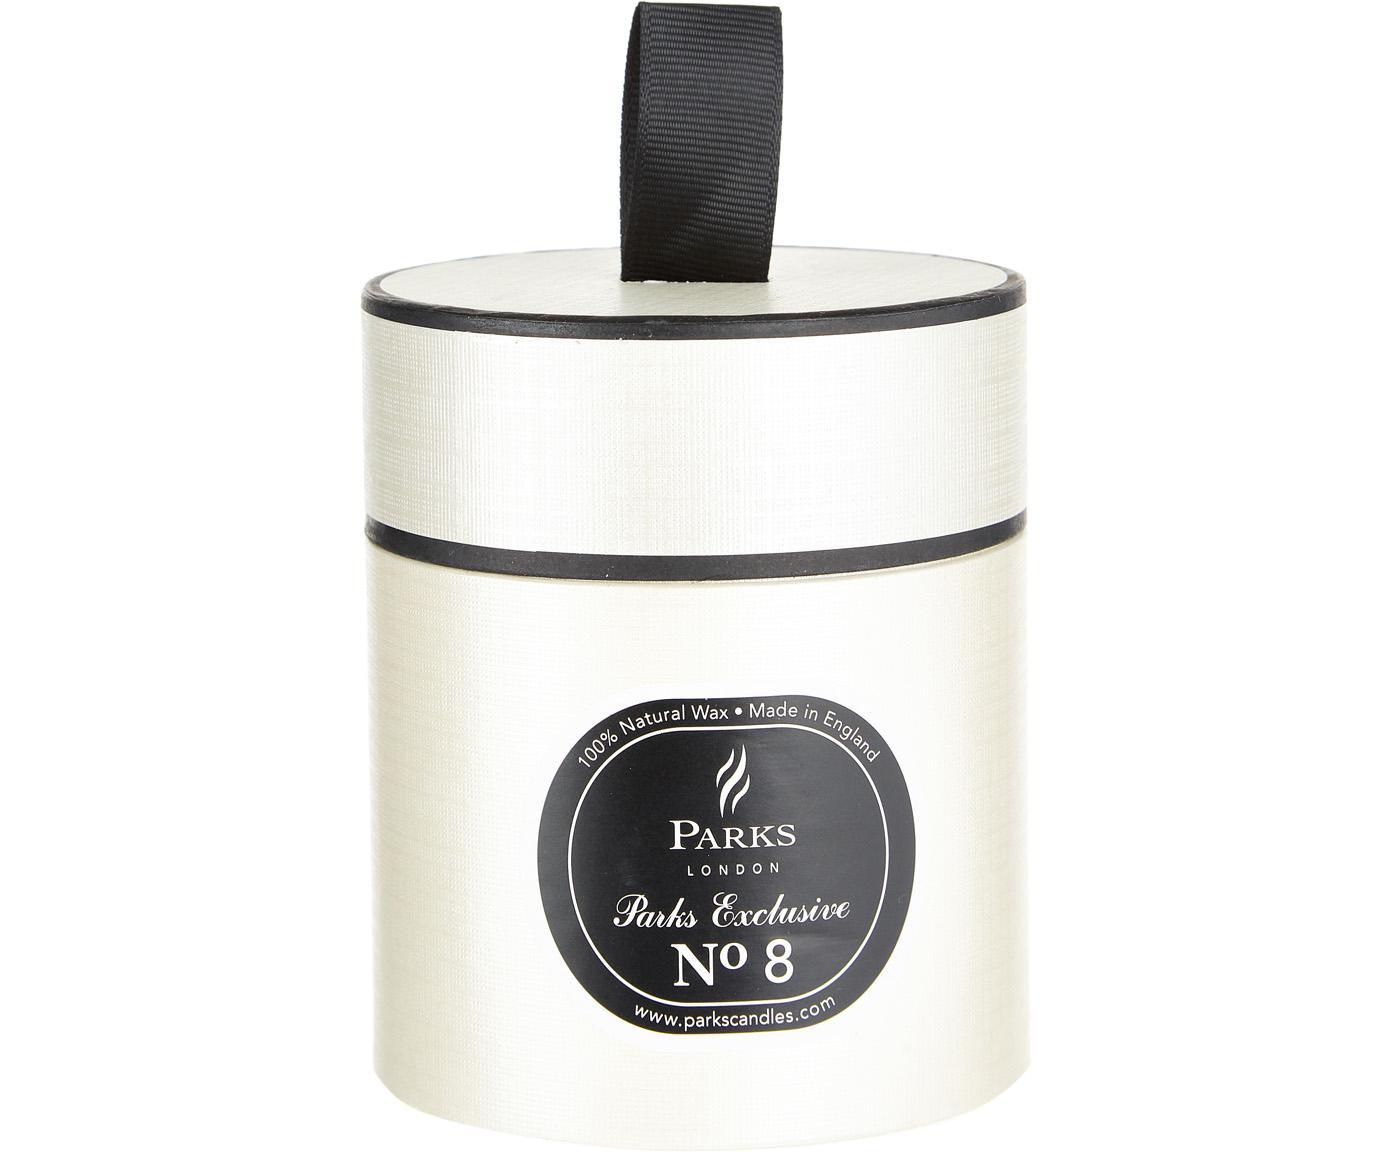 Geurkaars Exclusive No 8 (kampvuur), Houder: melkglas, Wit, zwart, Ø 8 x H 9 cm